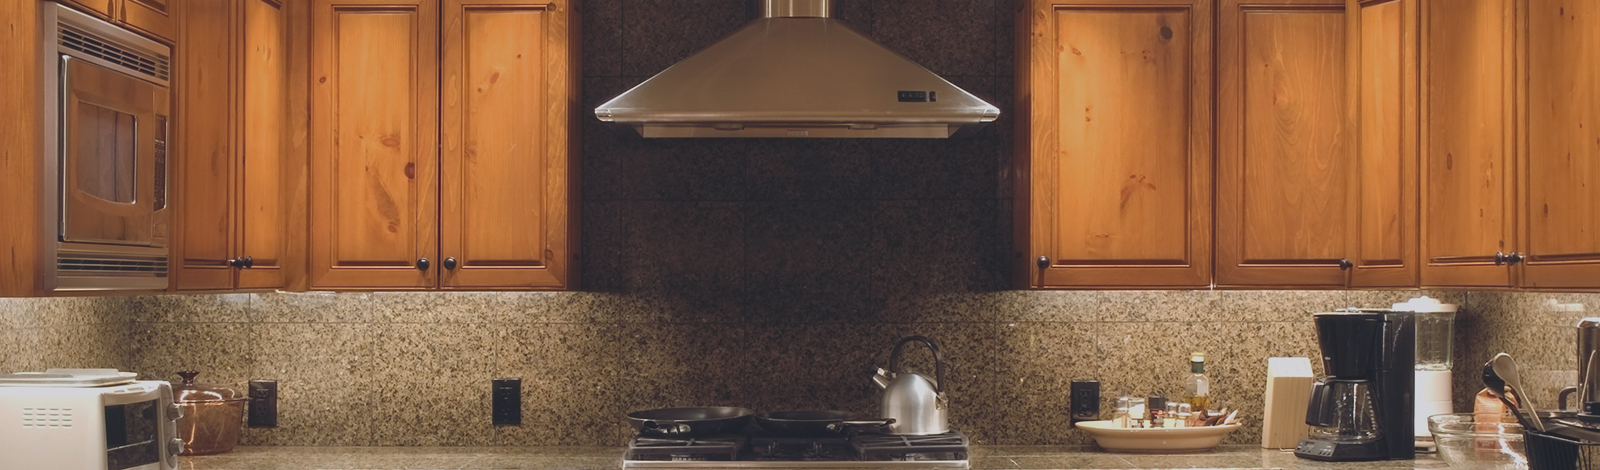 Armoires de cuisine et de salle de bain en bois fabrique plus - Armoire salle de bain bois ...